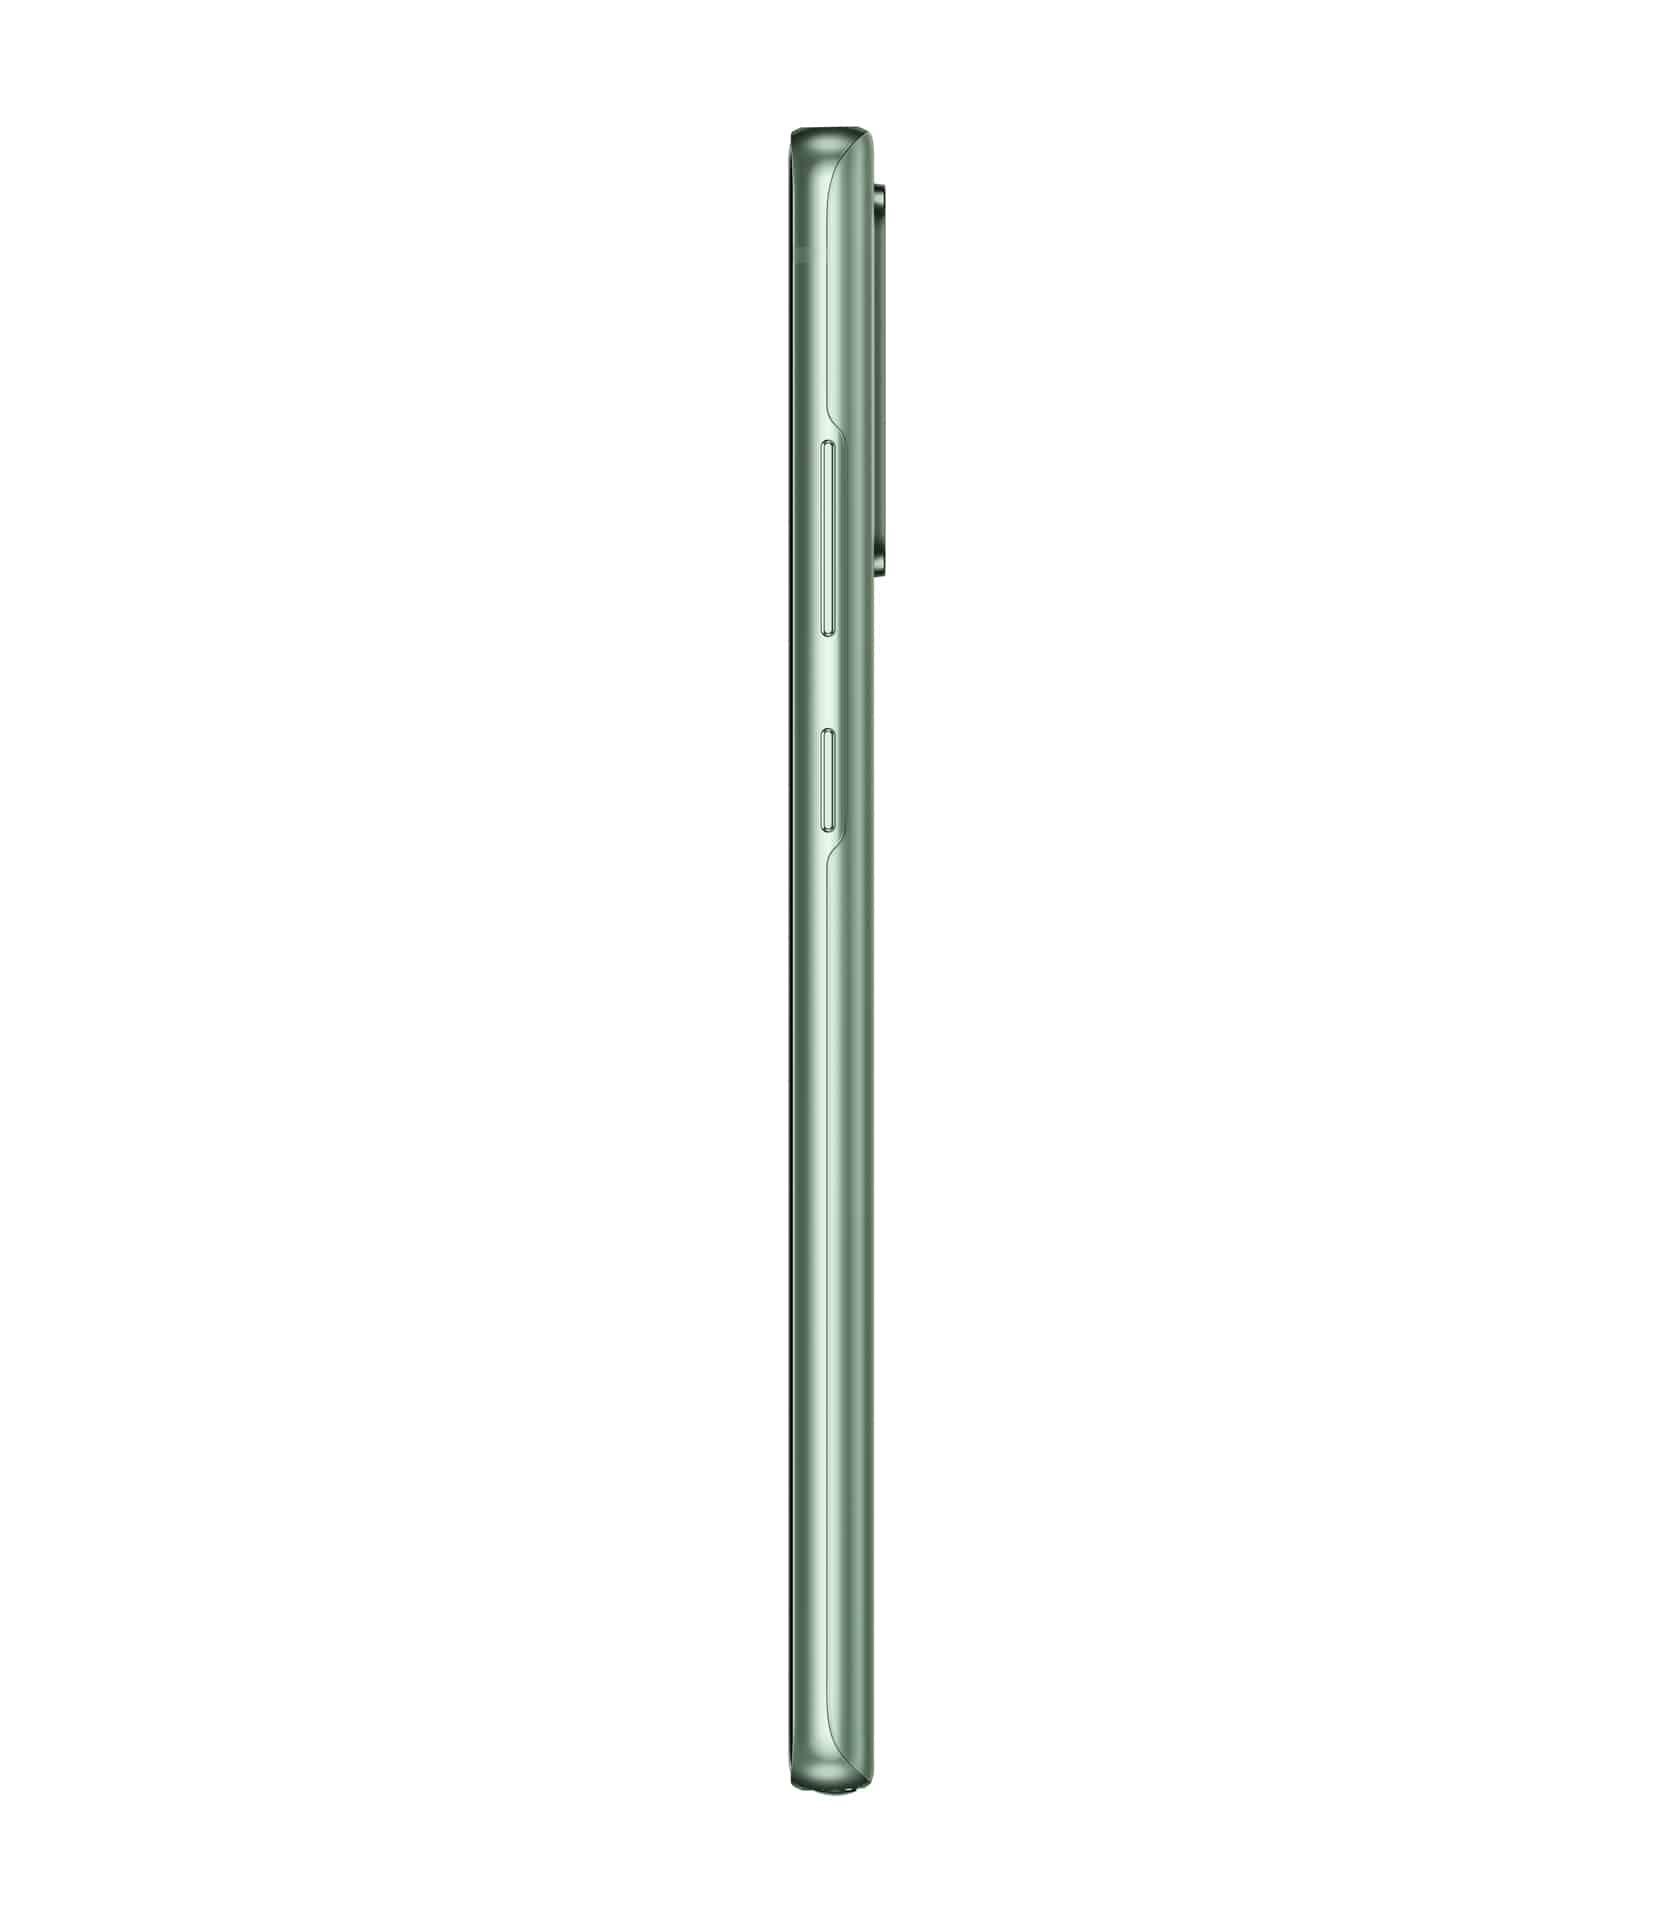 Galaxy Note20 Mystic Green Right Profile